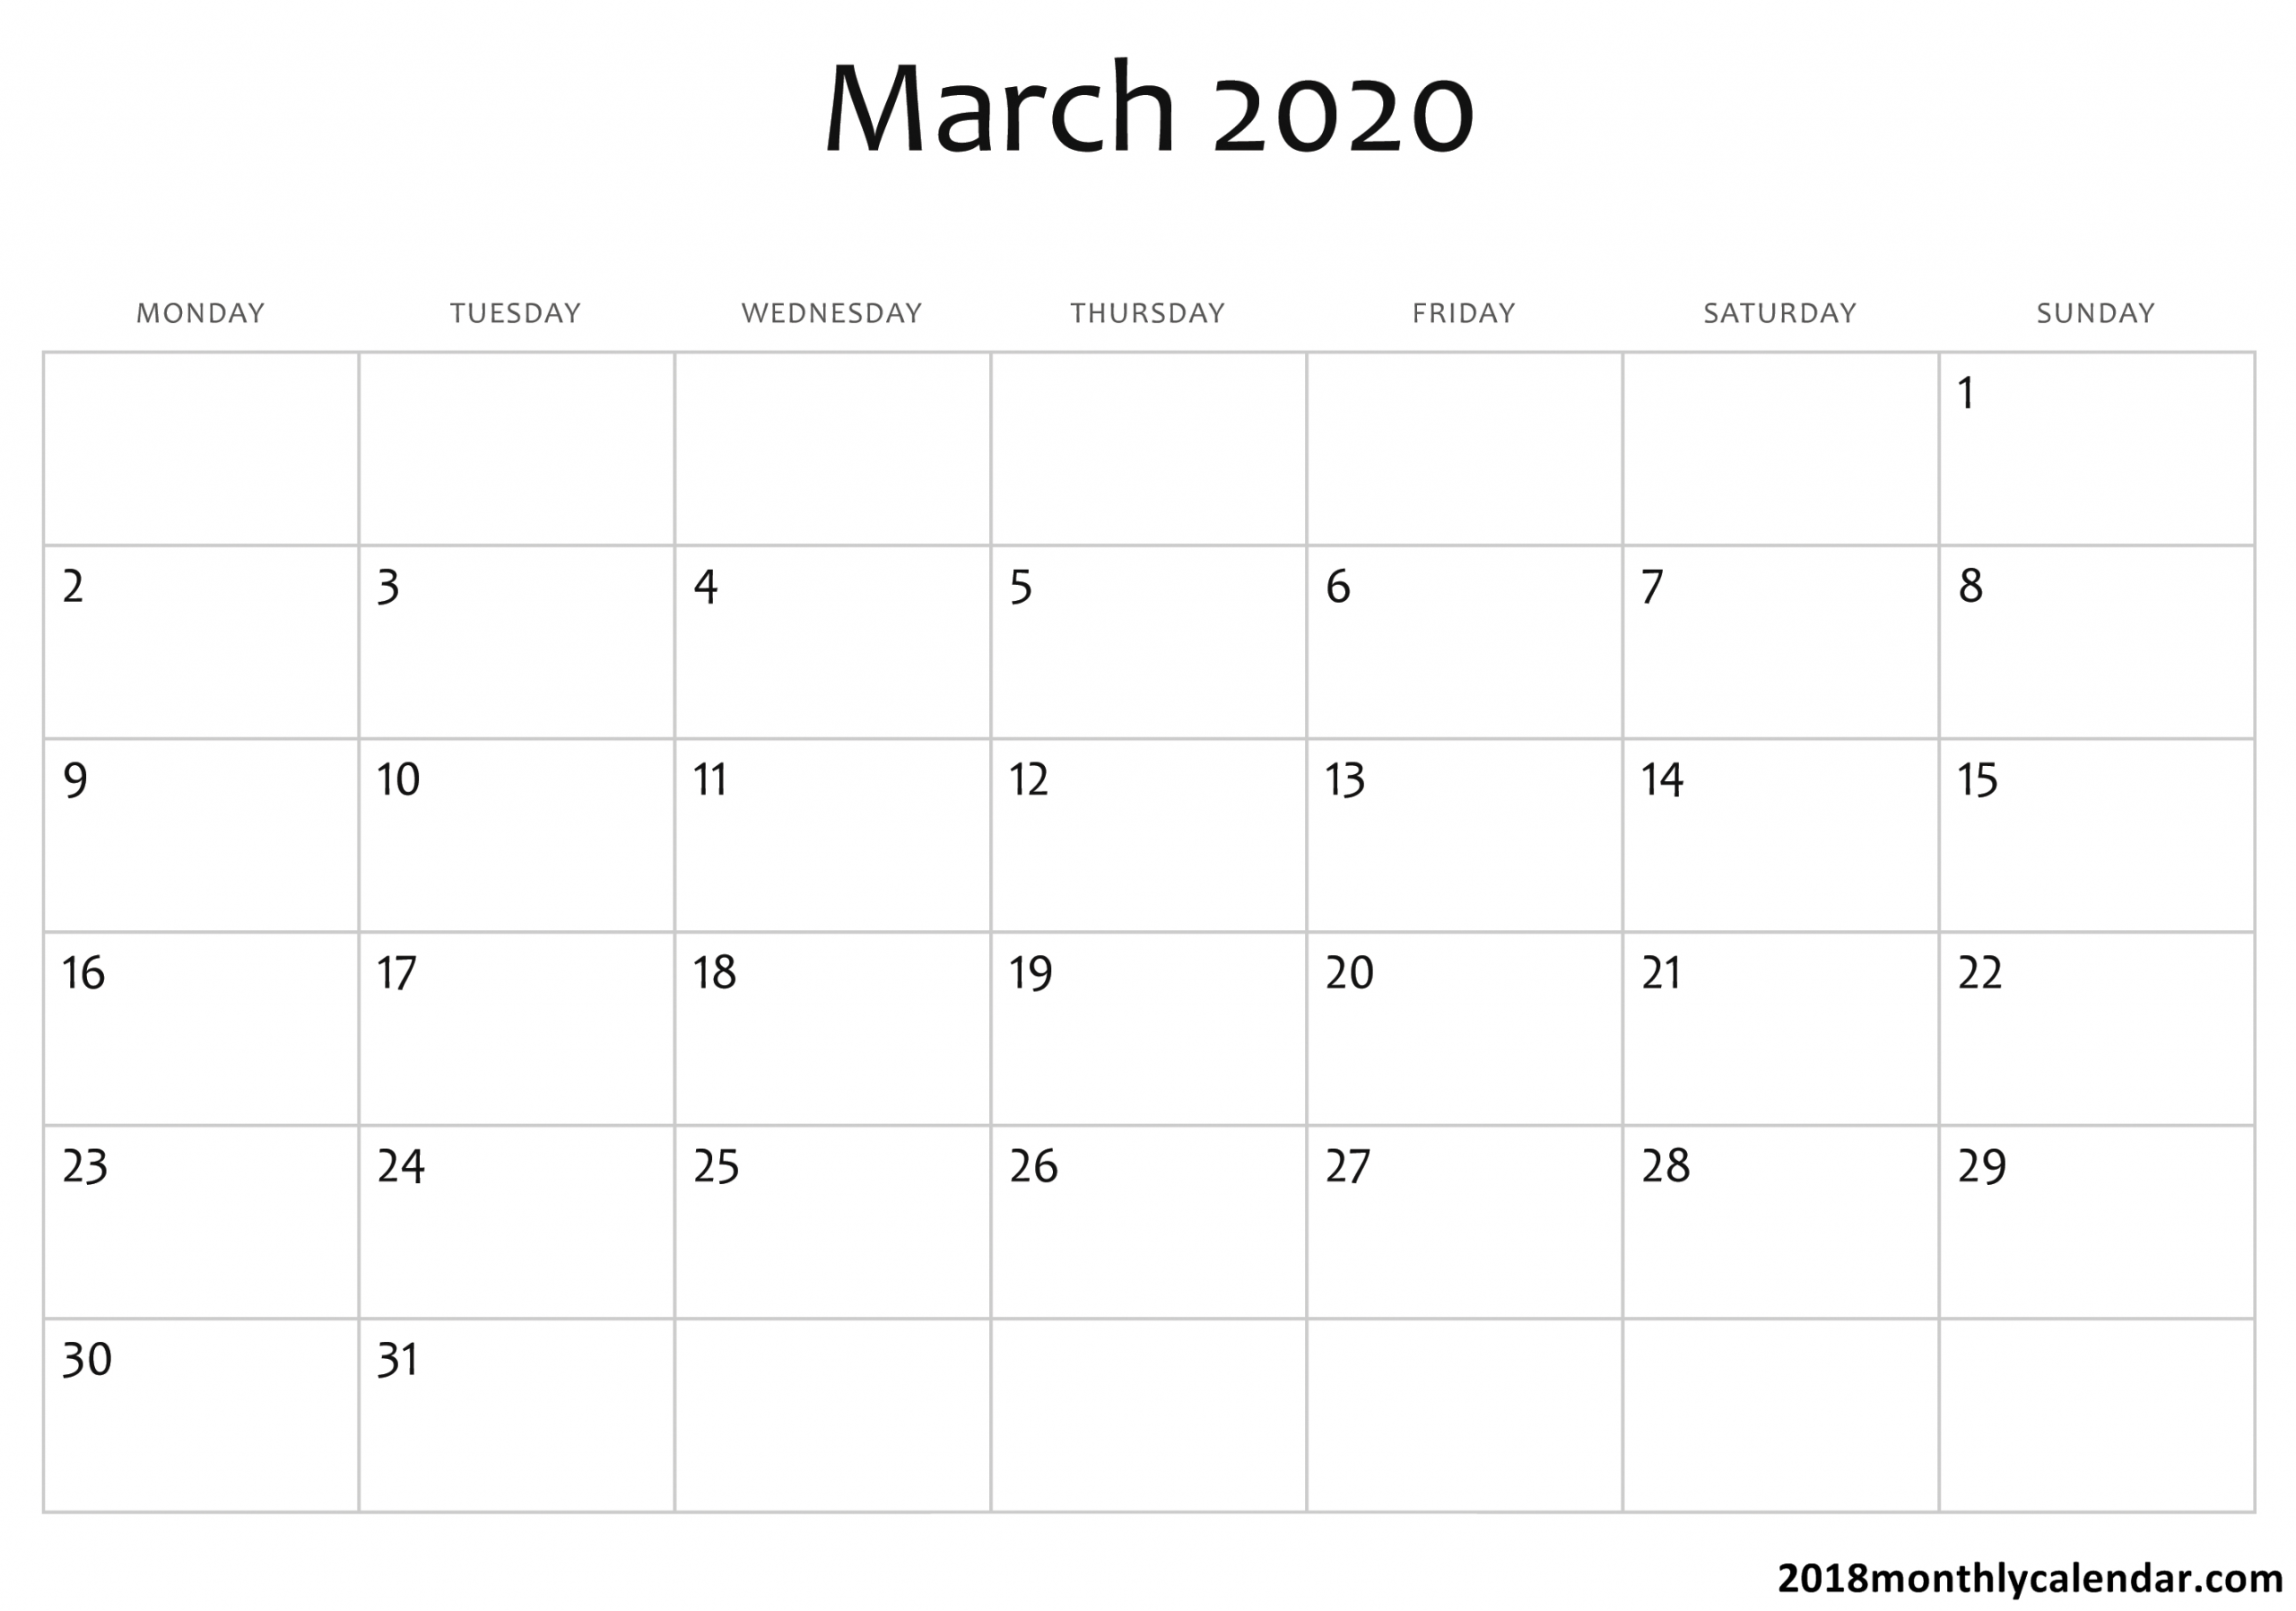 2020 Calendar You Can Edit | Calendar Template Printable Monthly Calendars You Can Edit